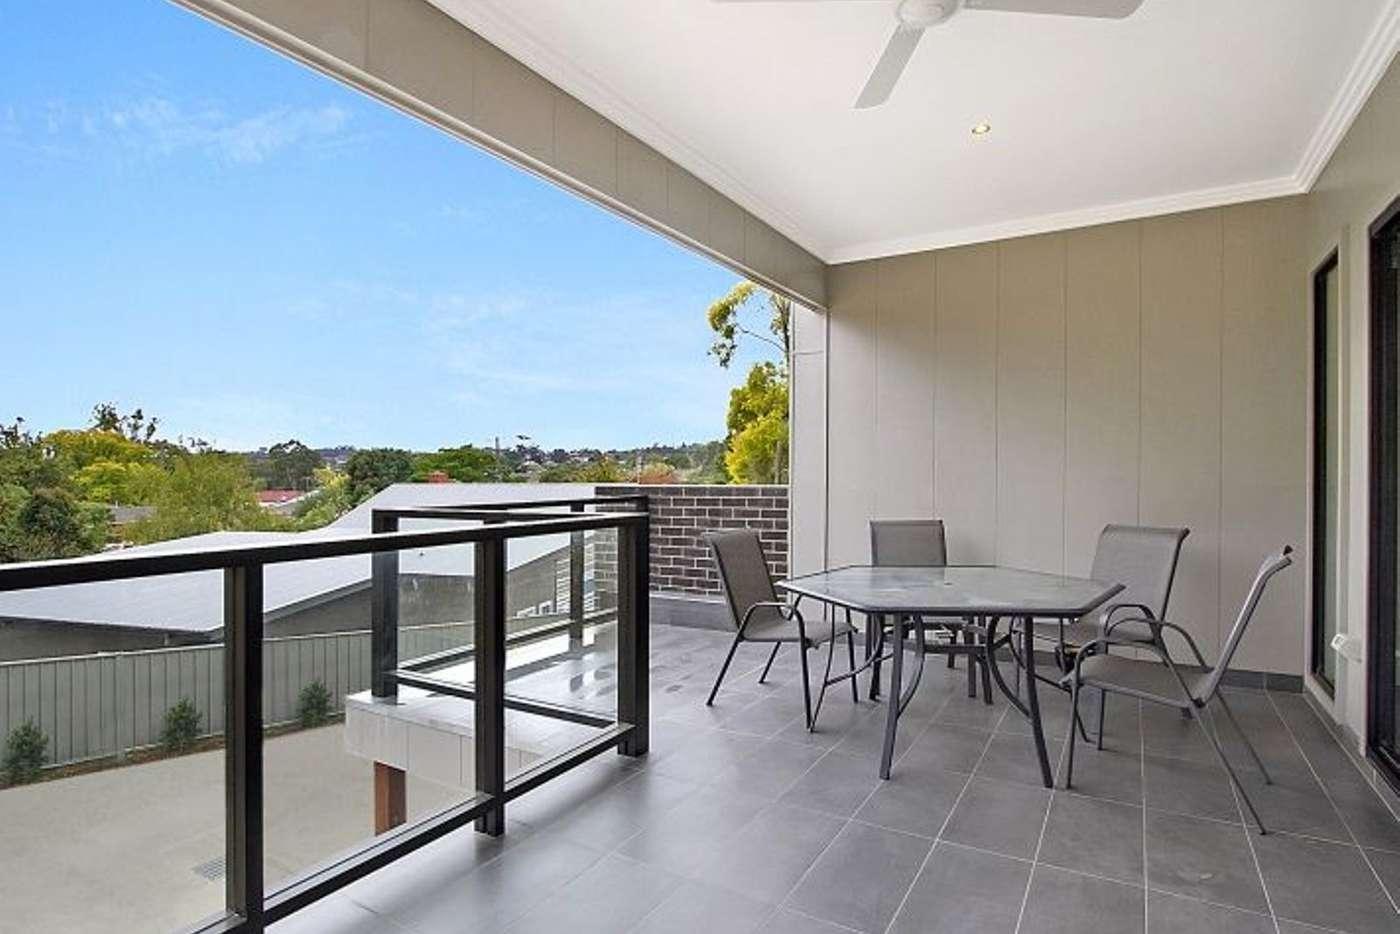 Seventh view of Homely house listing, 2/15 Abbott Street, Bendigo VIC 3550